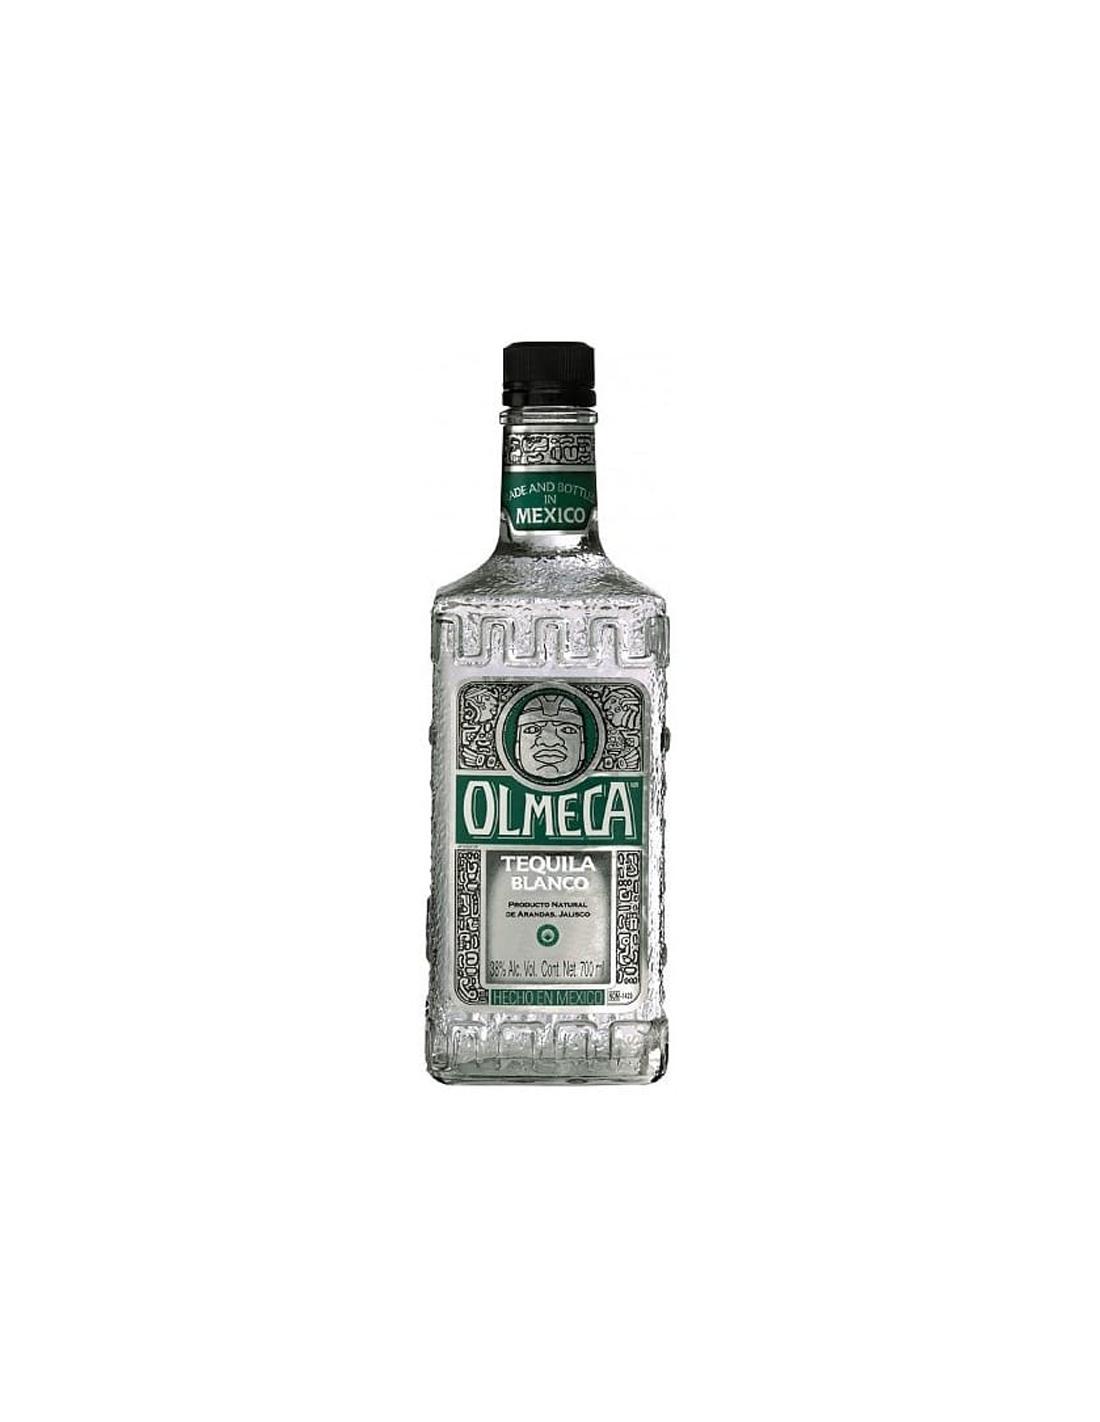 Tequila alba Olmeca Blanco 0.7L, 38% alc., Mexic